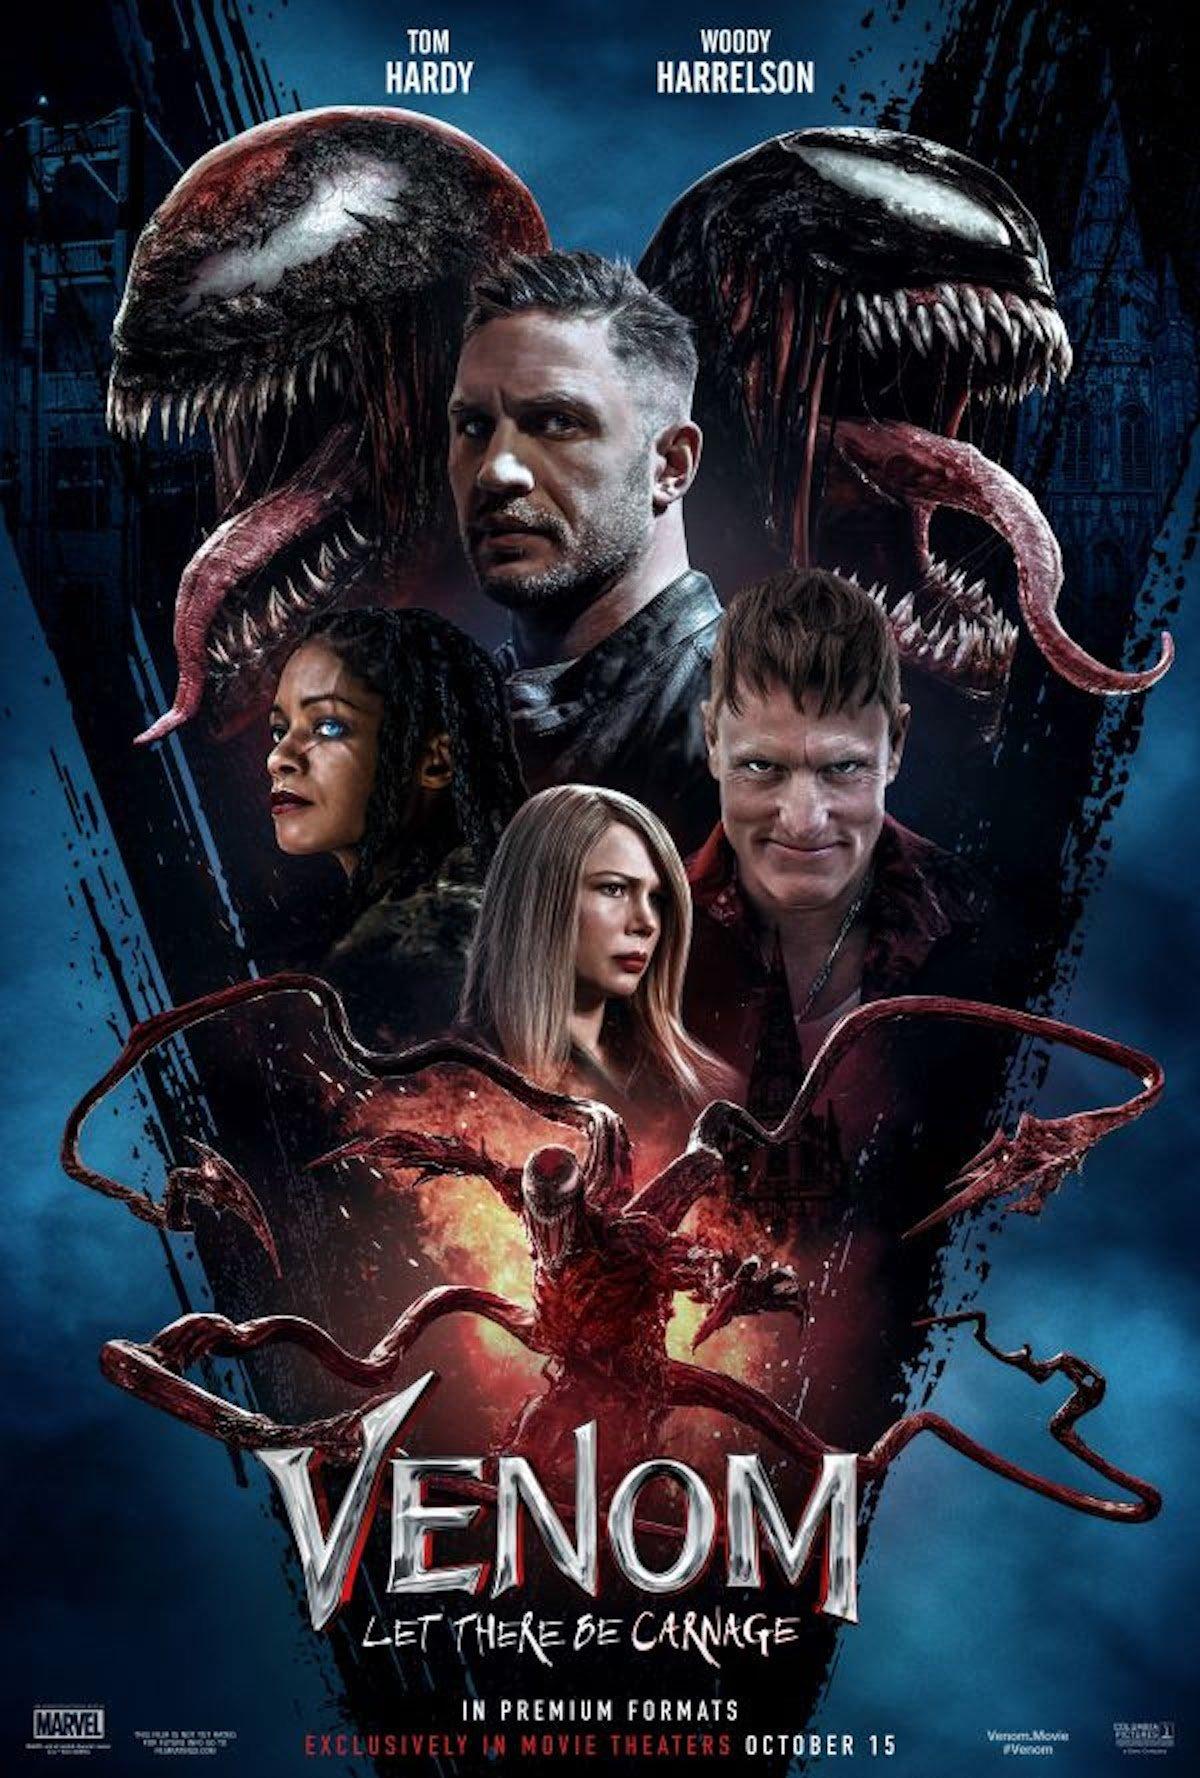 The Venom 2 poster